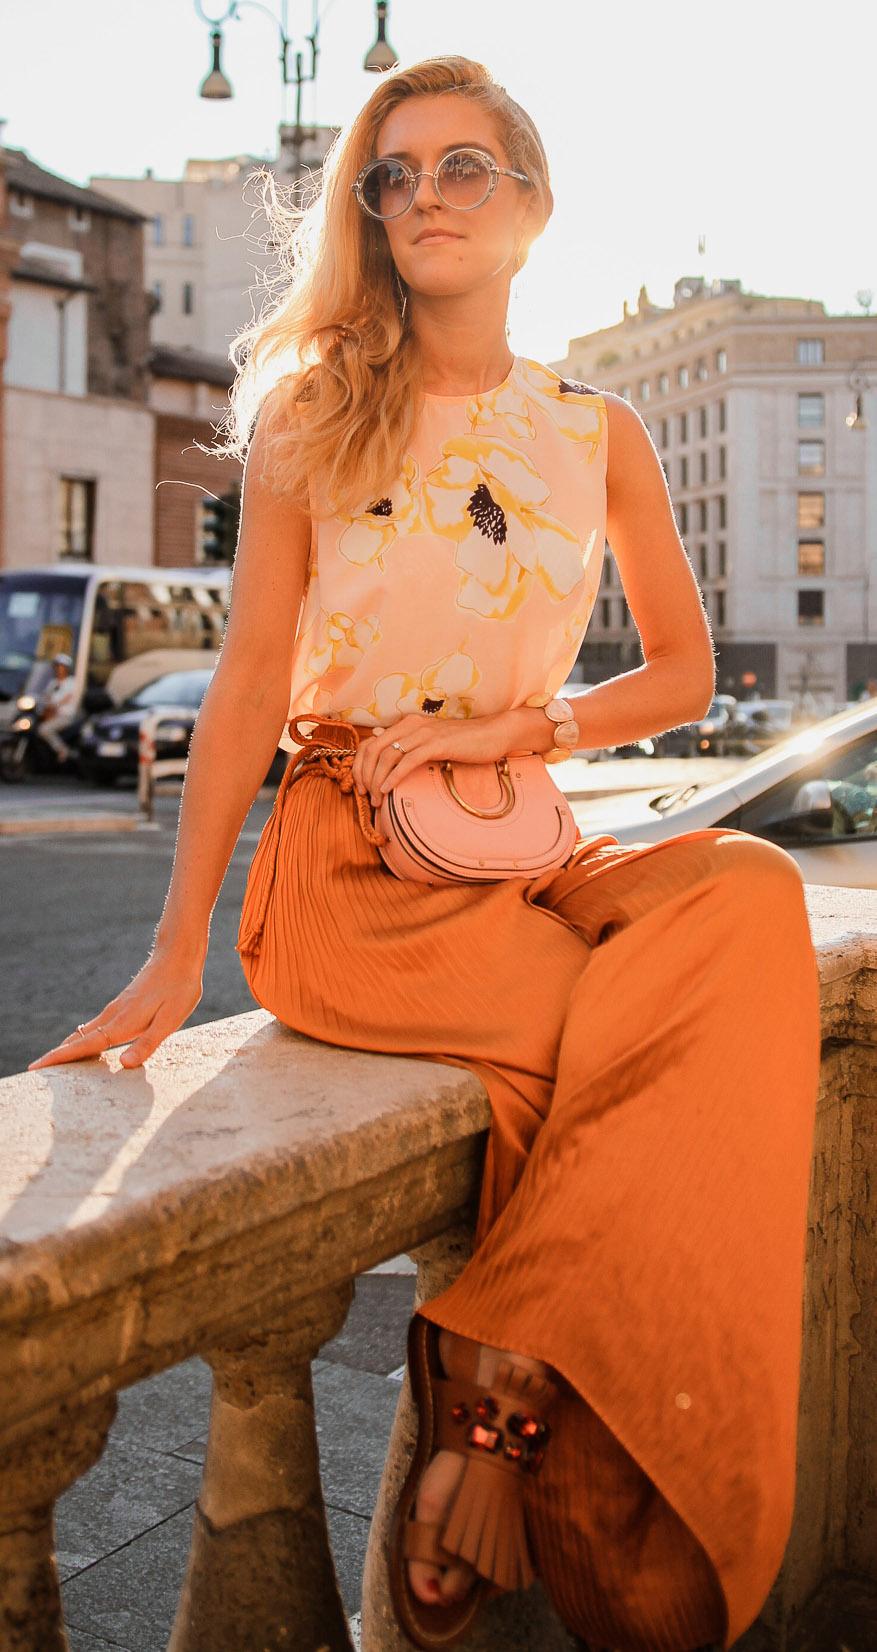 orange-wideleg-pants-peach-bag-fannypack-cognac-shoe-sandals-blonde-sun-yellow-top-floral-print-tonal-spring-summer-lunch.jpg